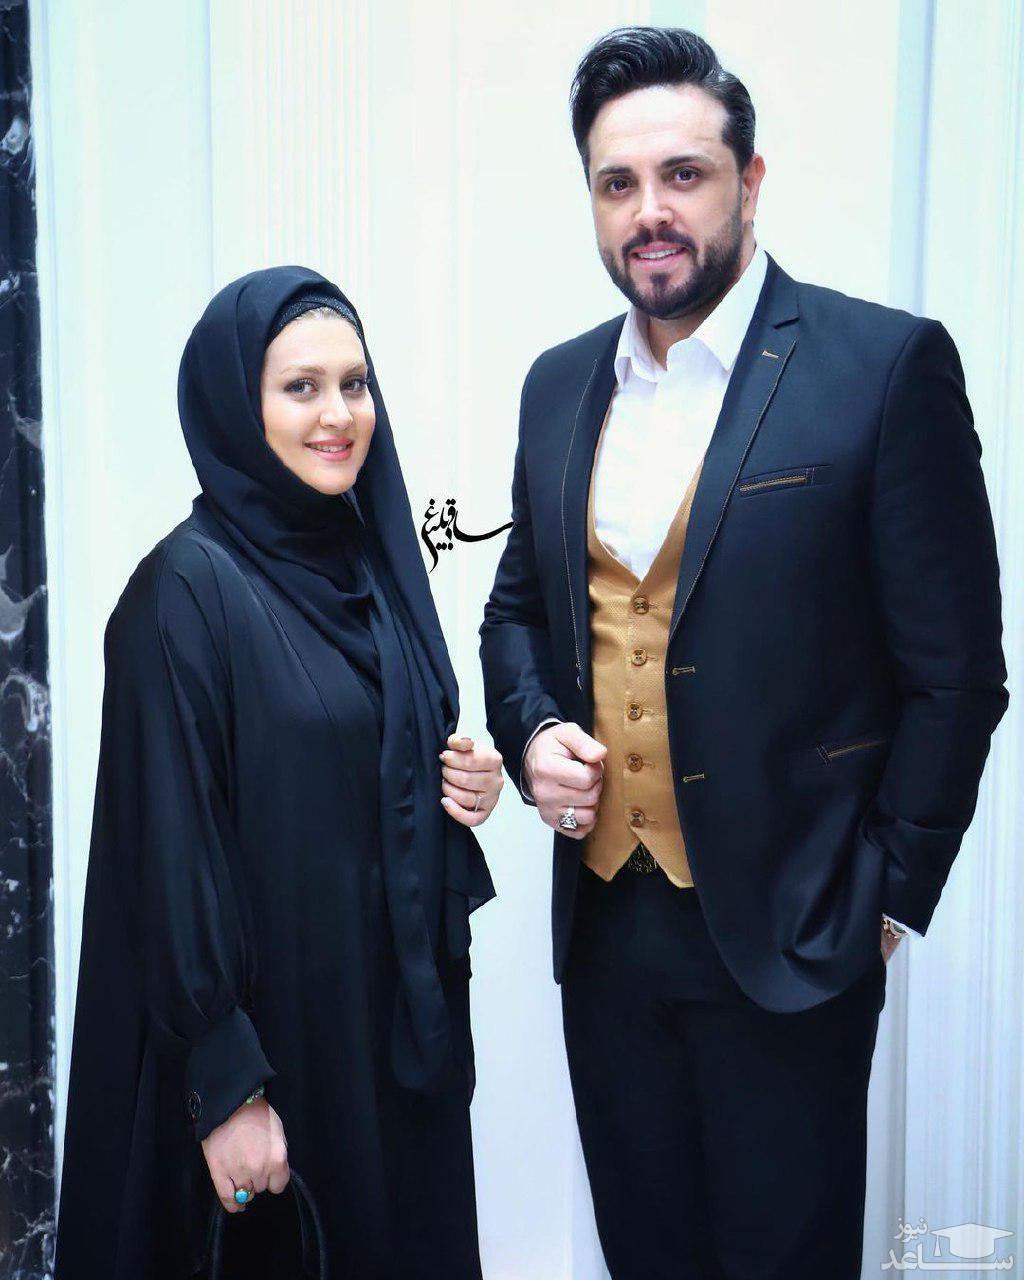 عکس تولد مجری مشهور تلویزیون در کنار همسرش